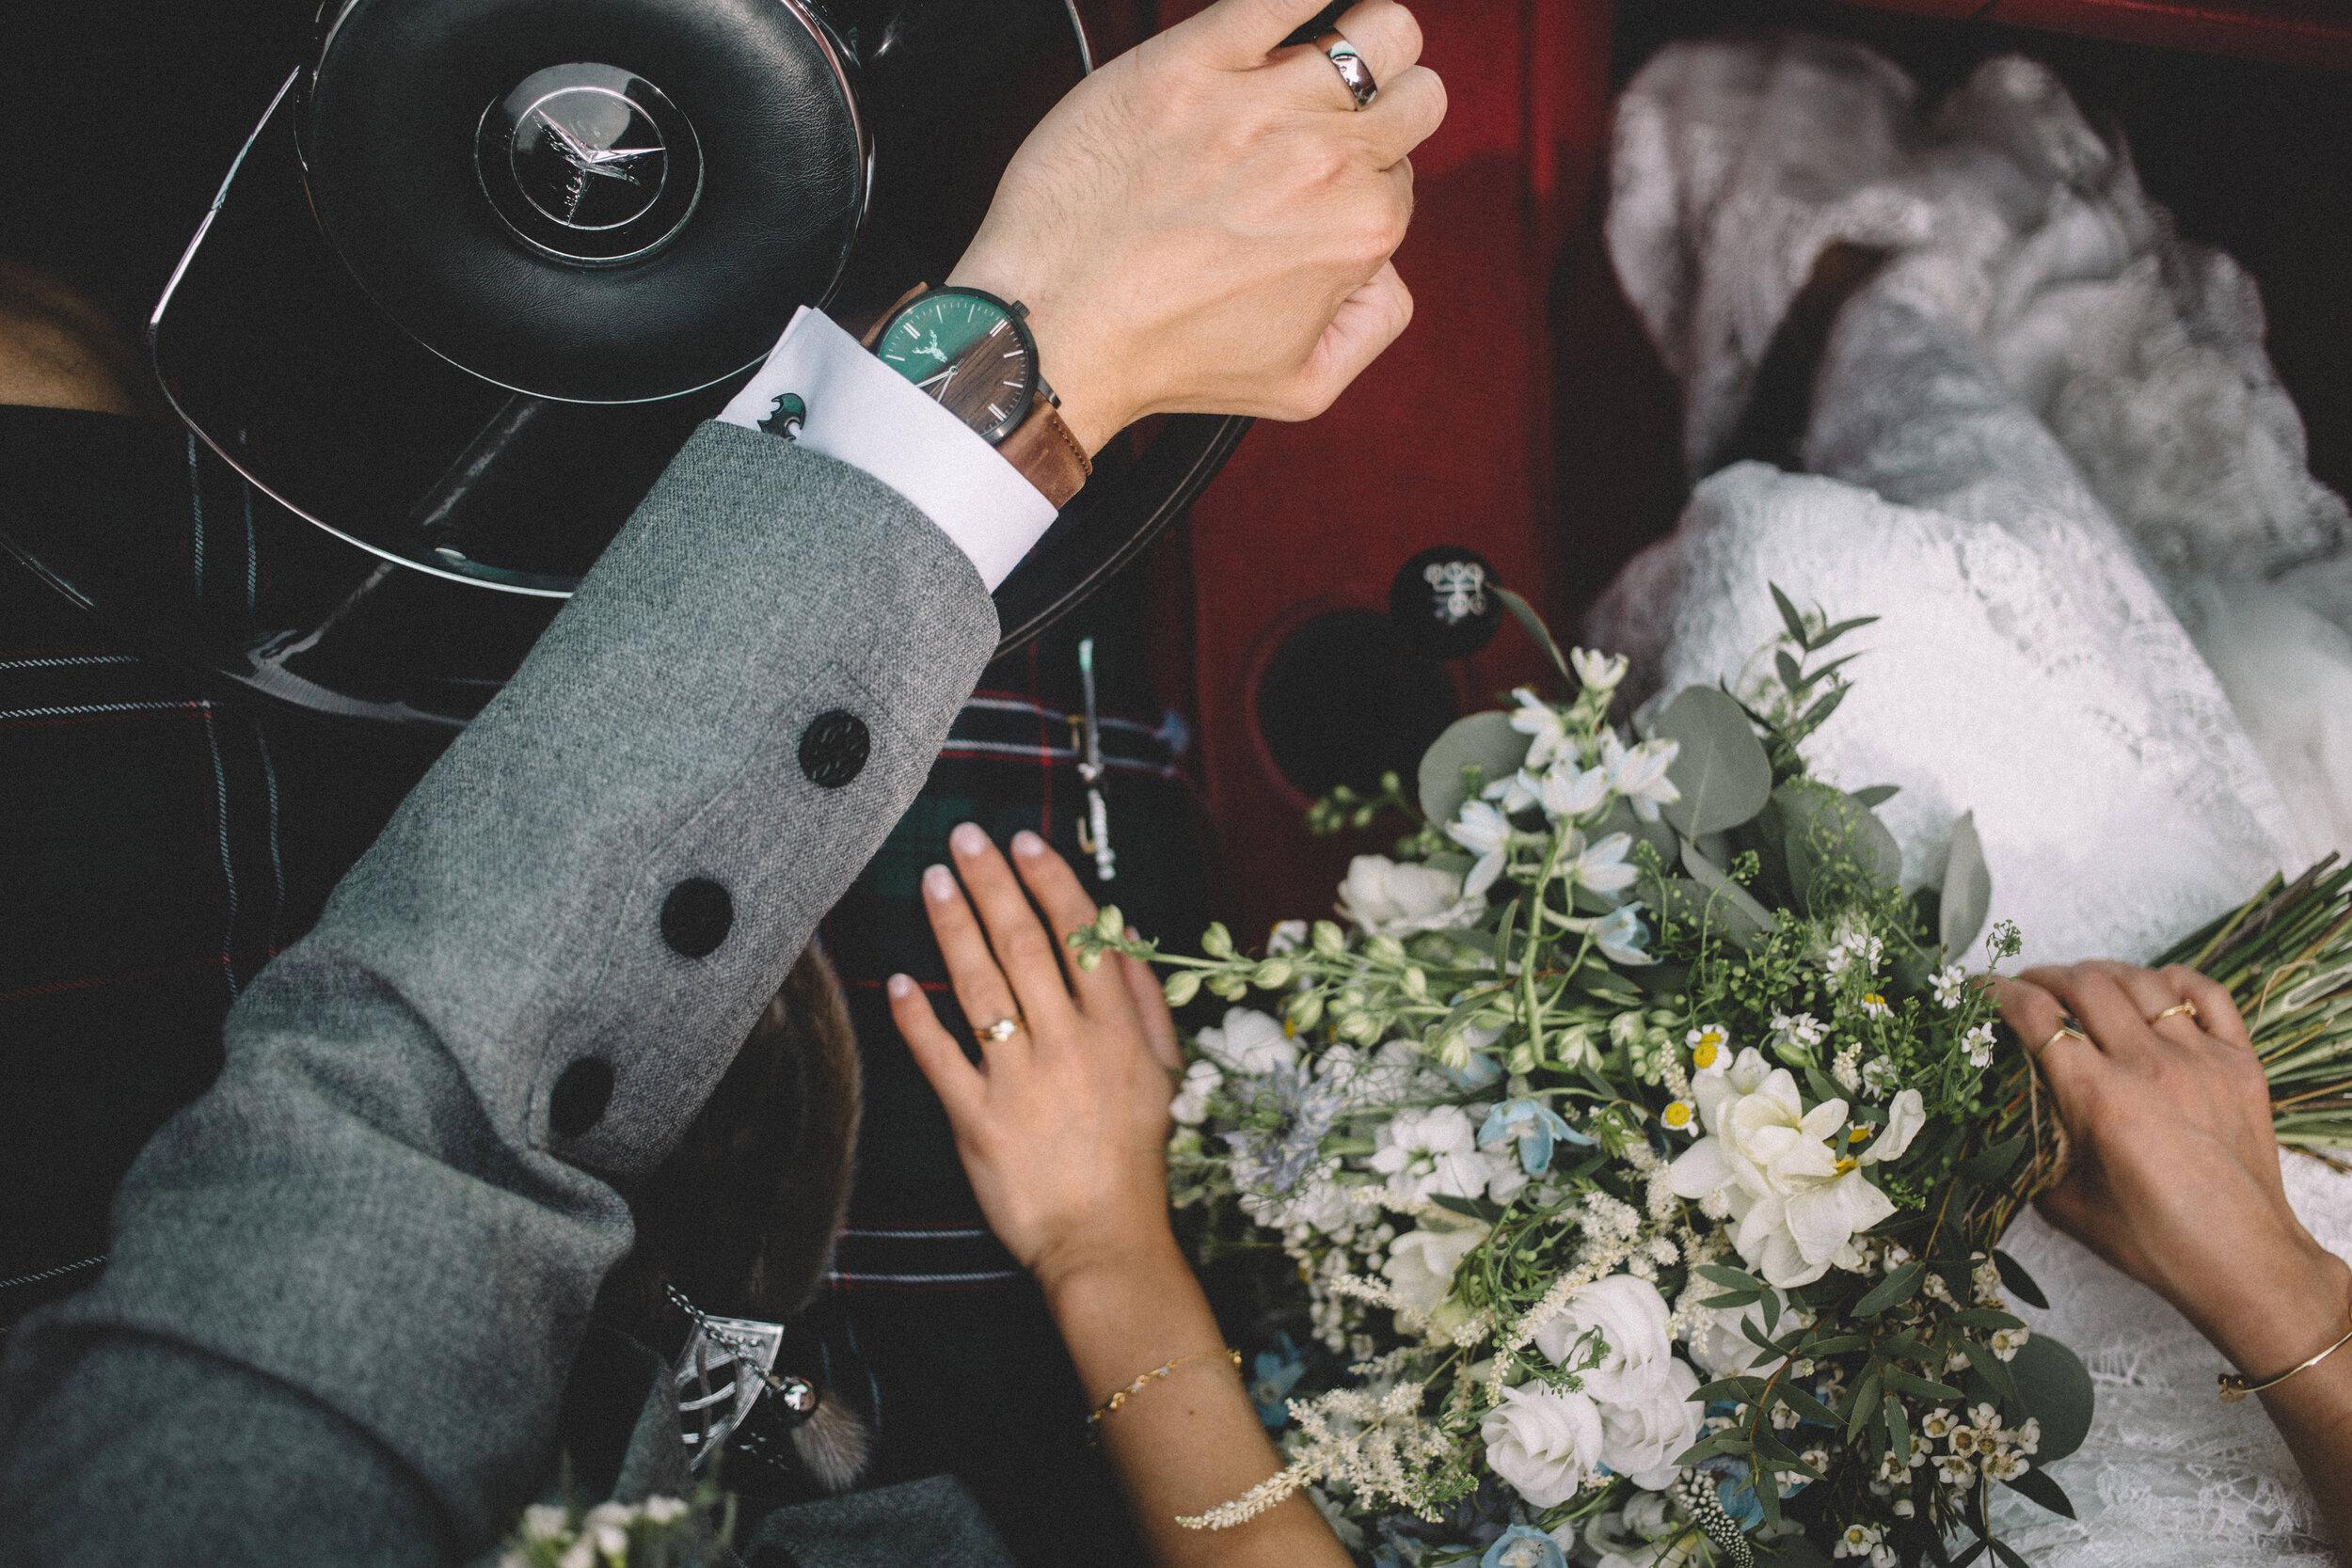 Dalduff Farm Ayrshire Wedding Photography - Claire Basiuk Photographer - 25.jpg